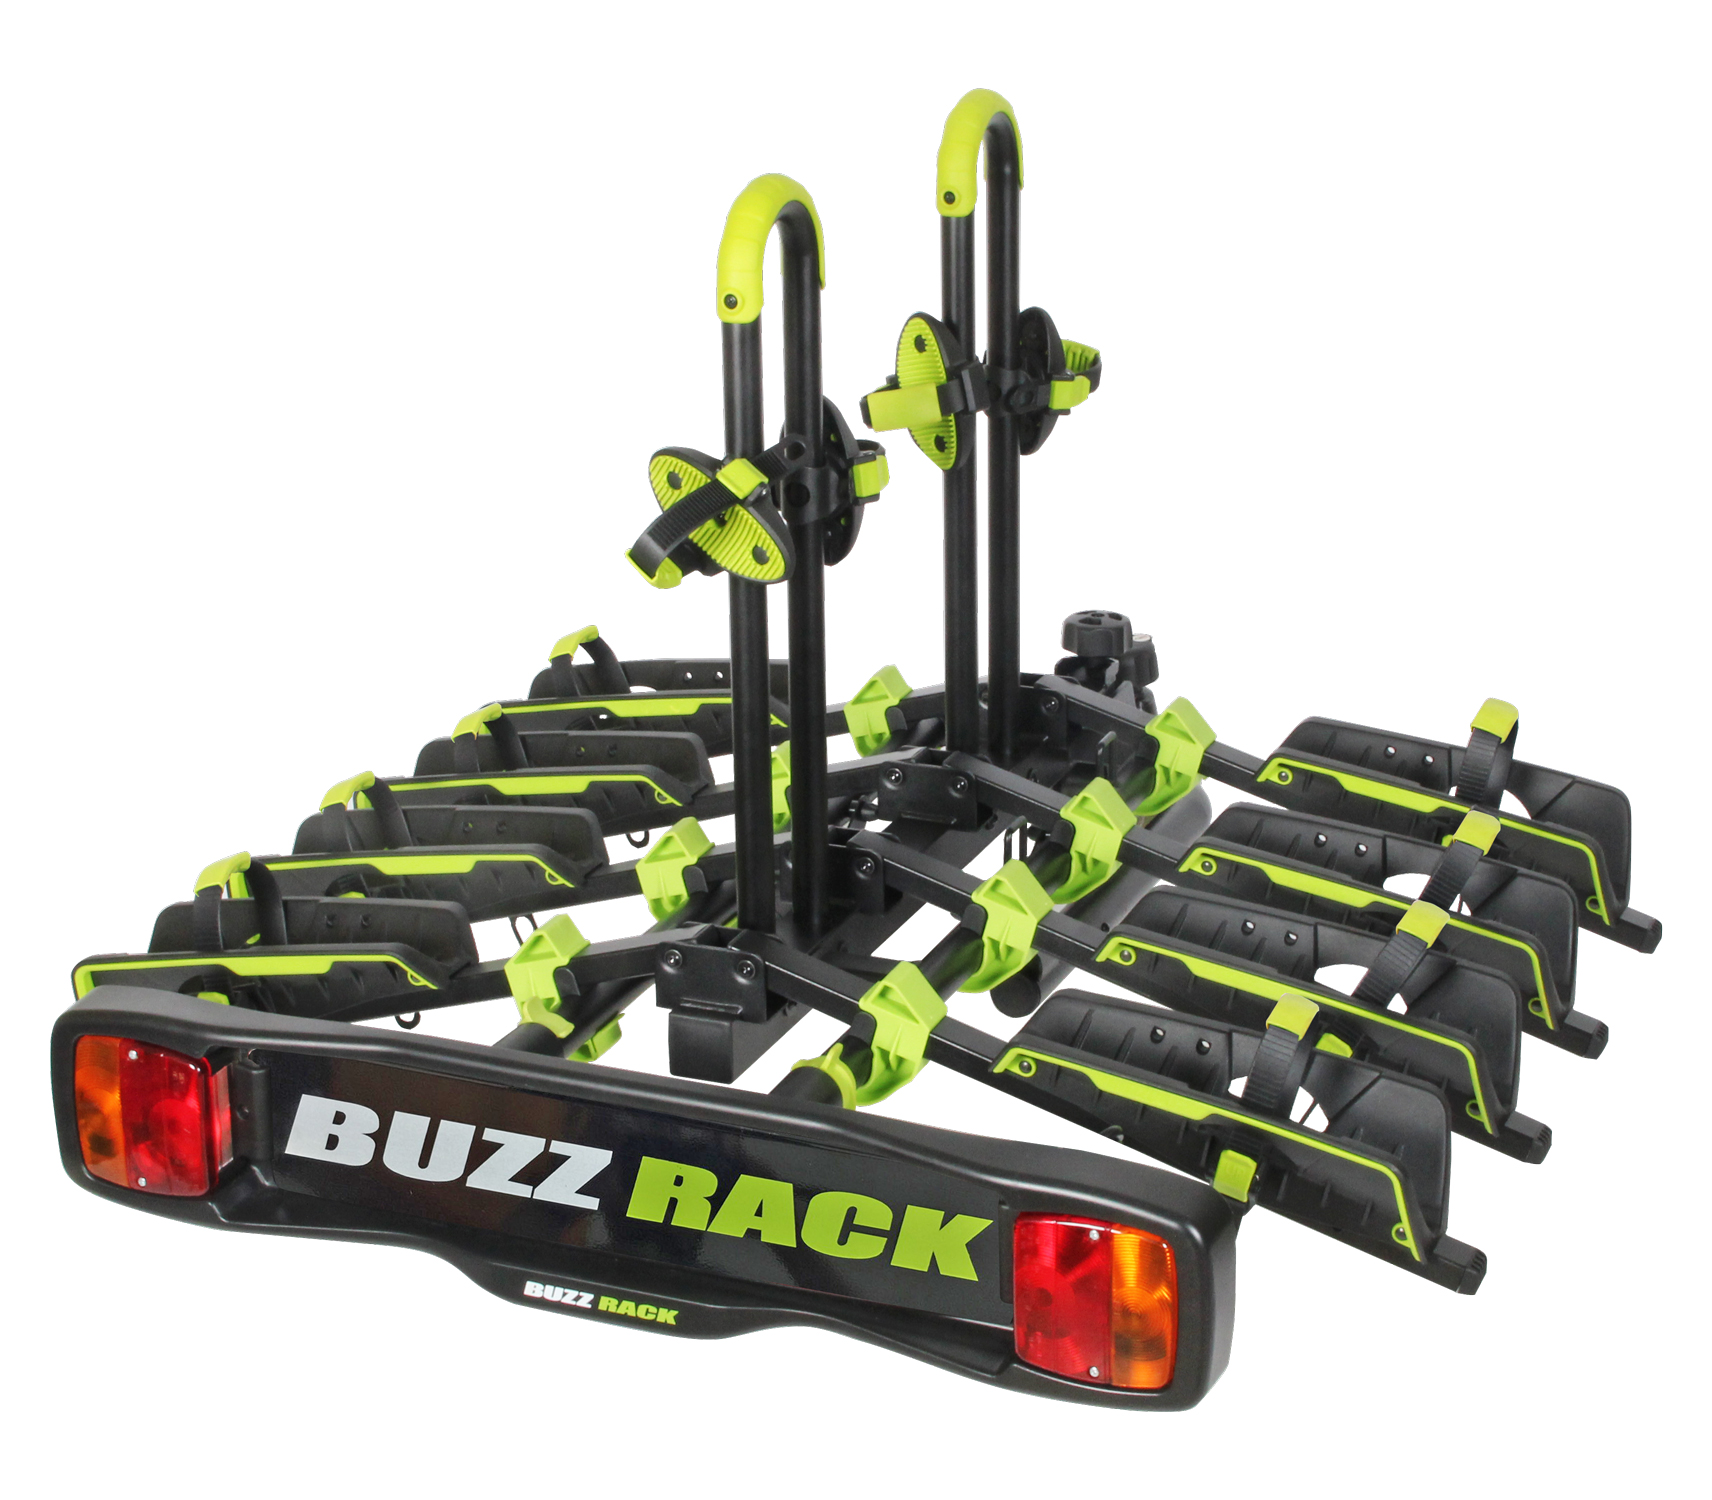 Buzzrack Buzzwing 4 - Cykelholder til 4 cykler - Sammenklappelig | Car racks